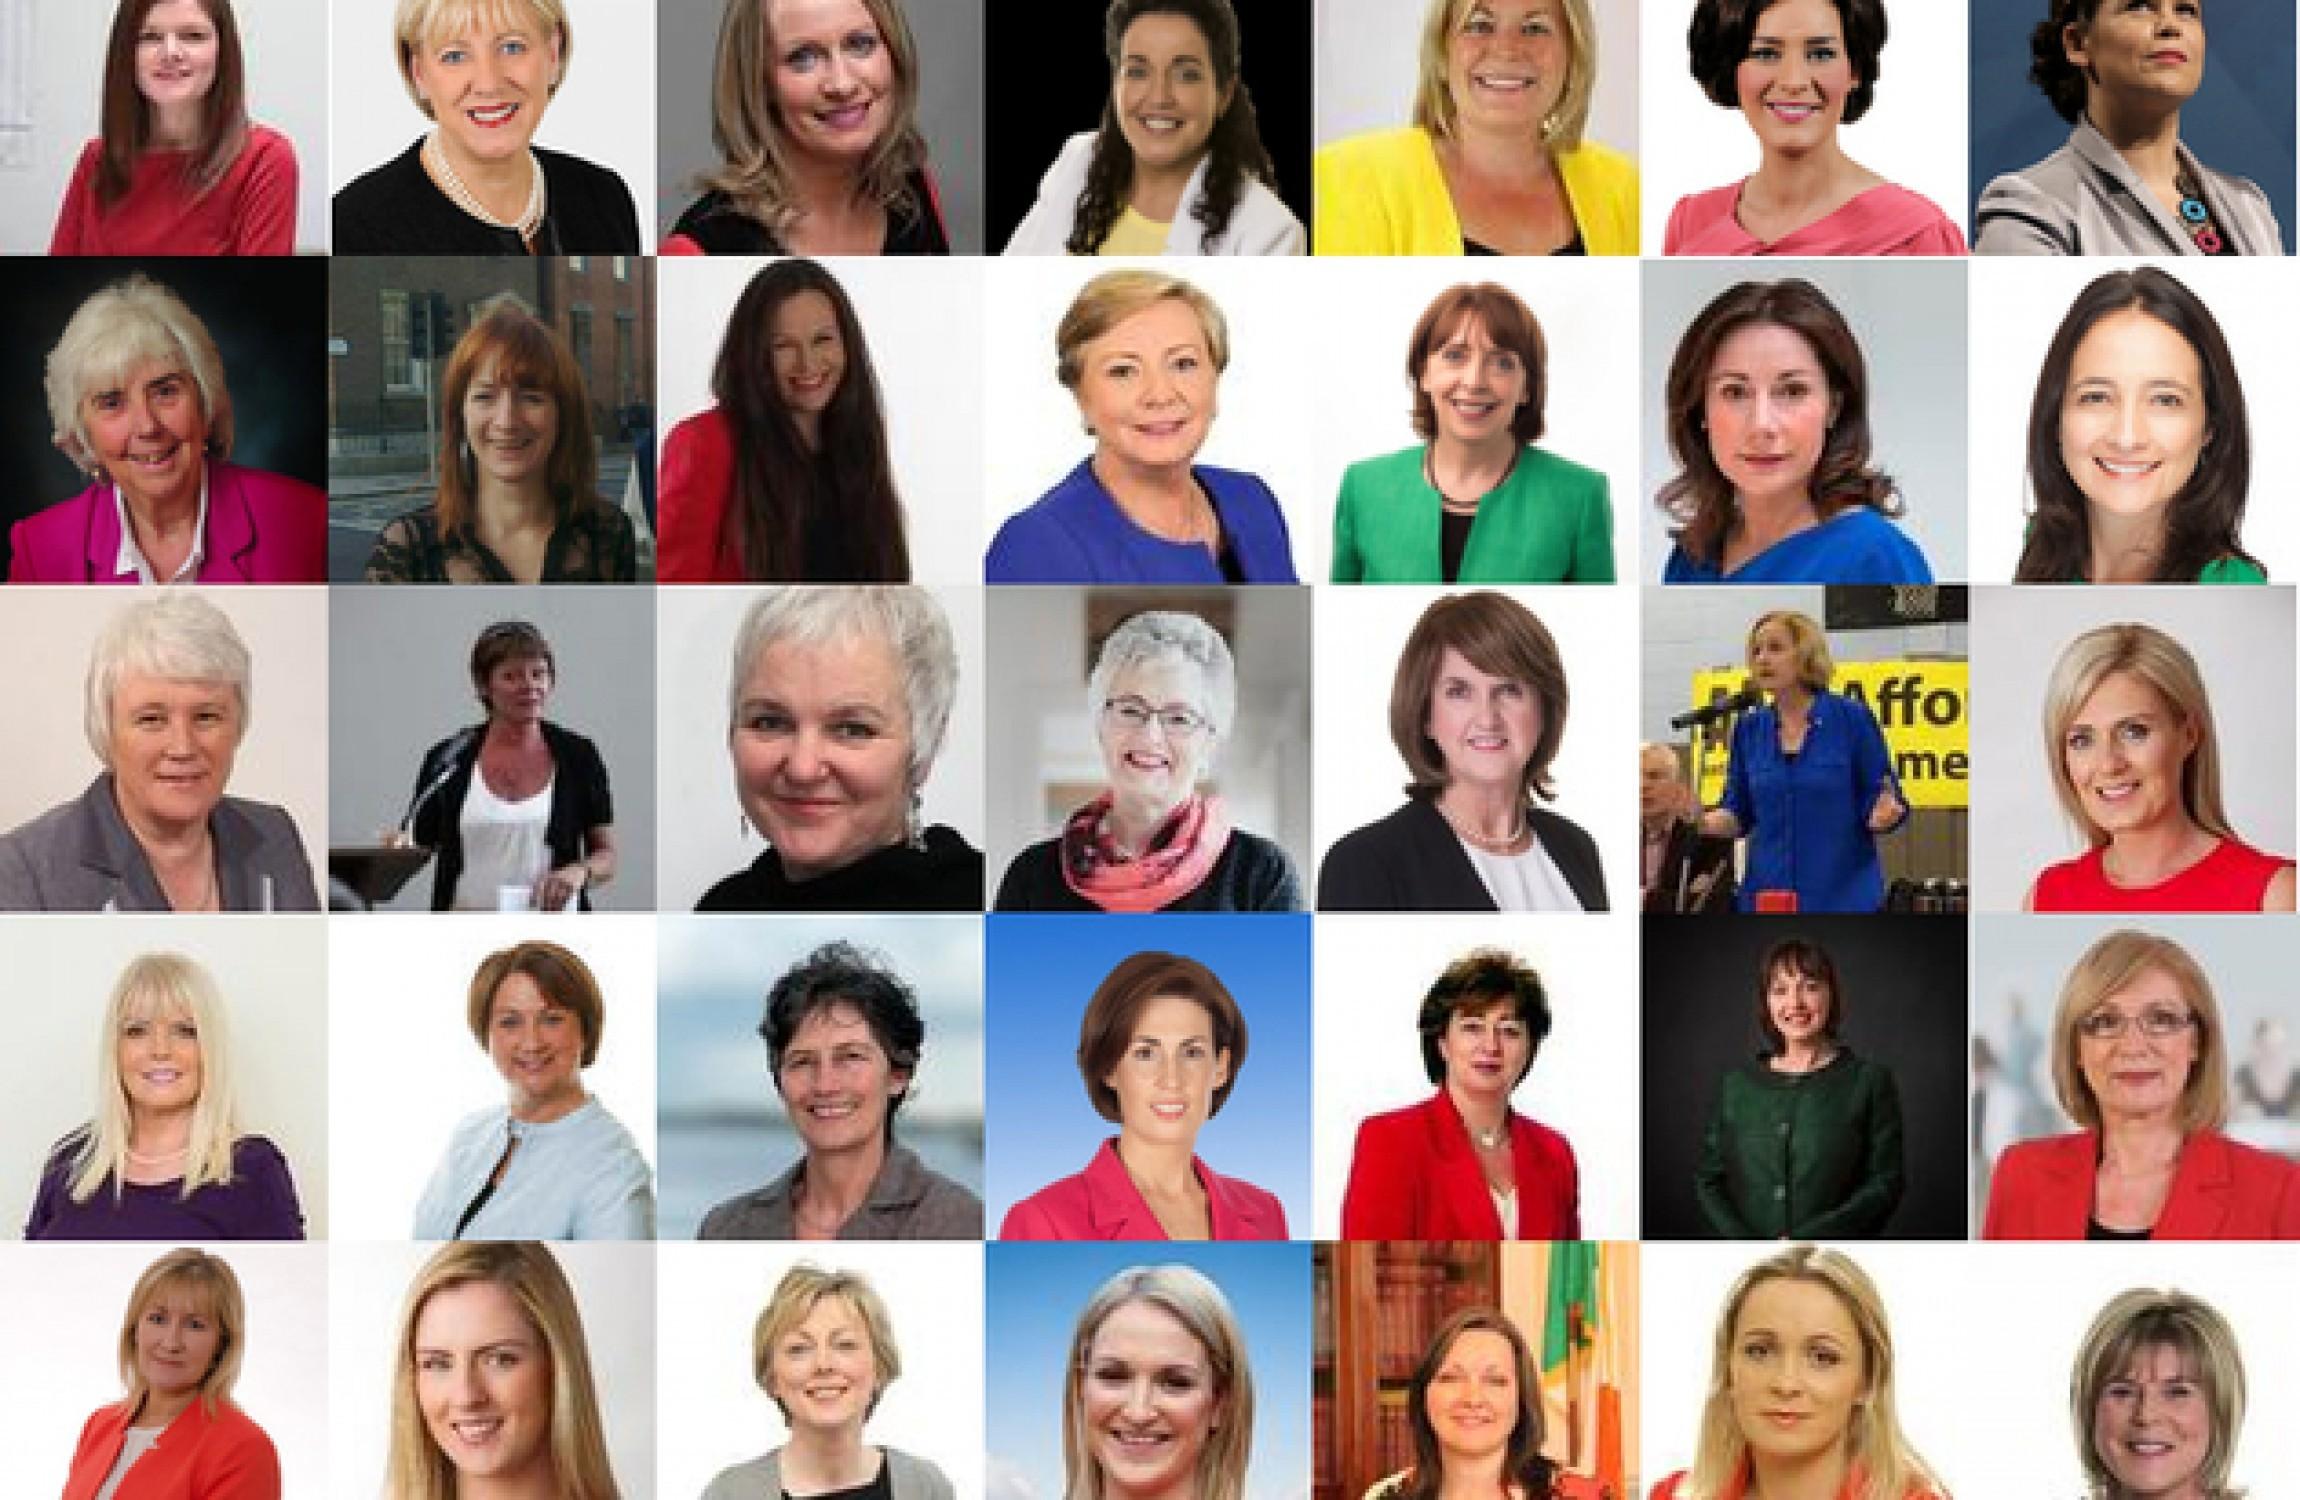 women in irish politics essay Pictures of anti irish political cartoons showing irish stereotypes and irish stereotyping.